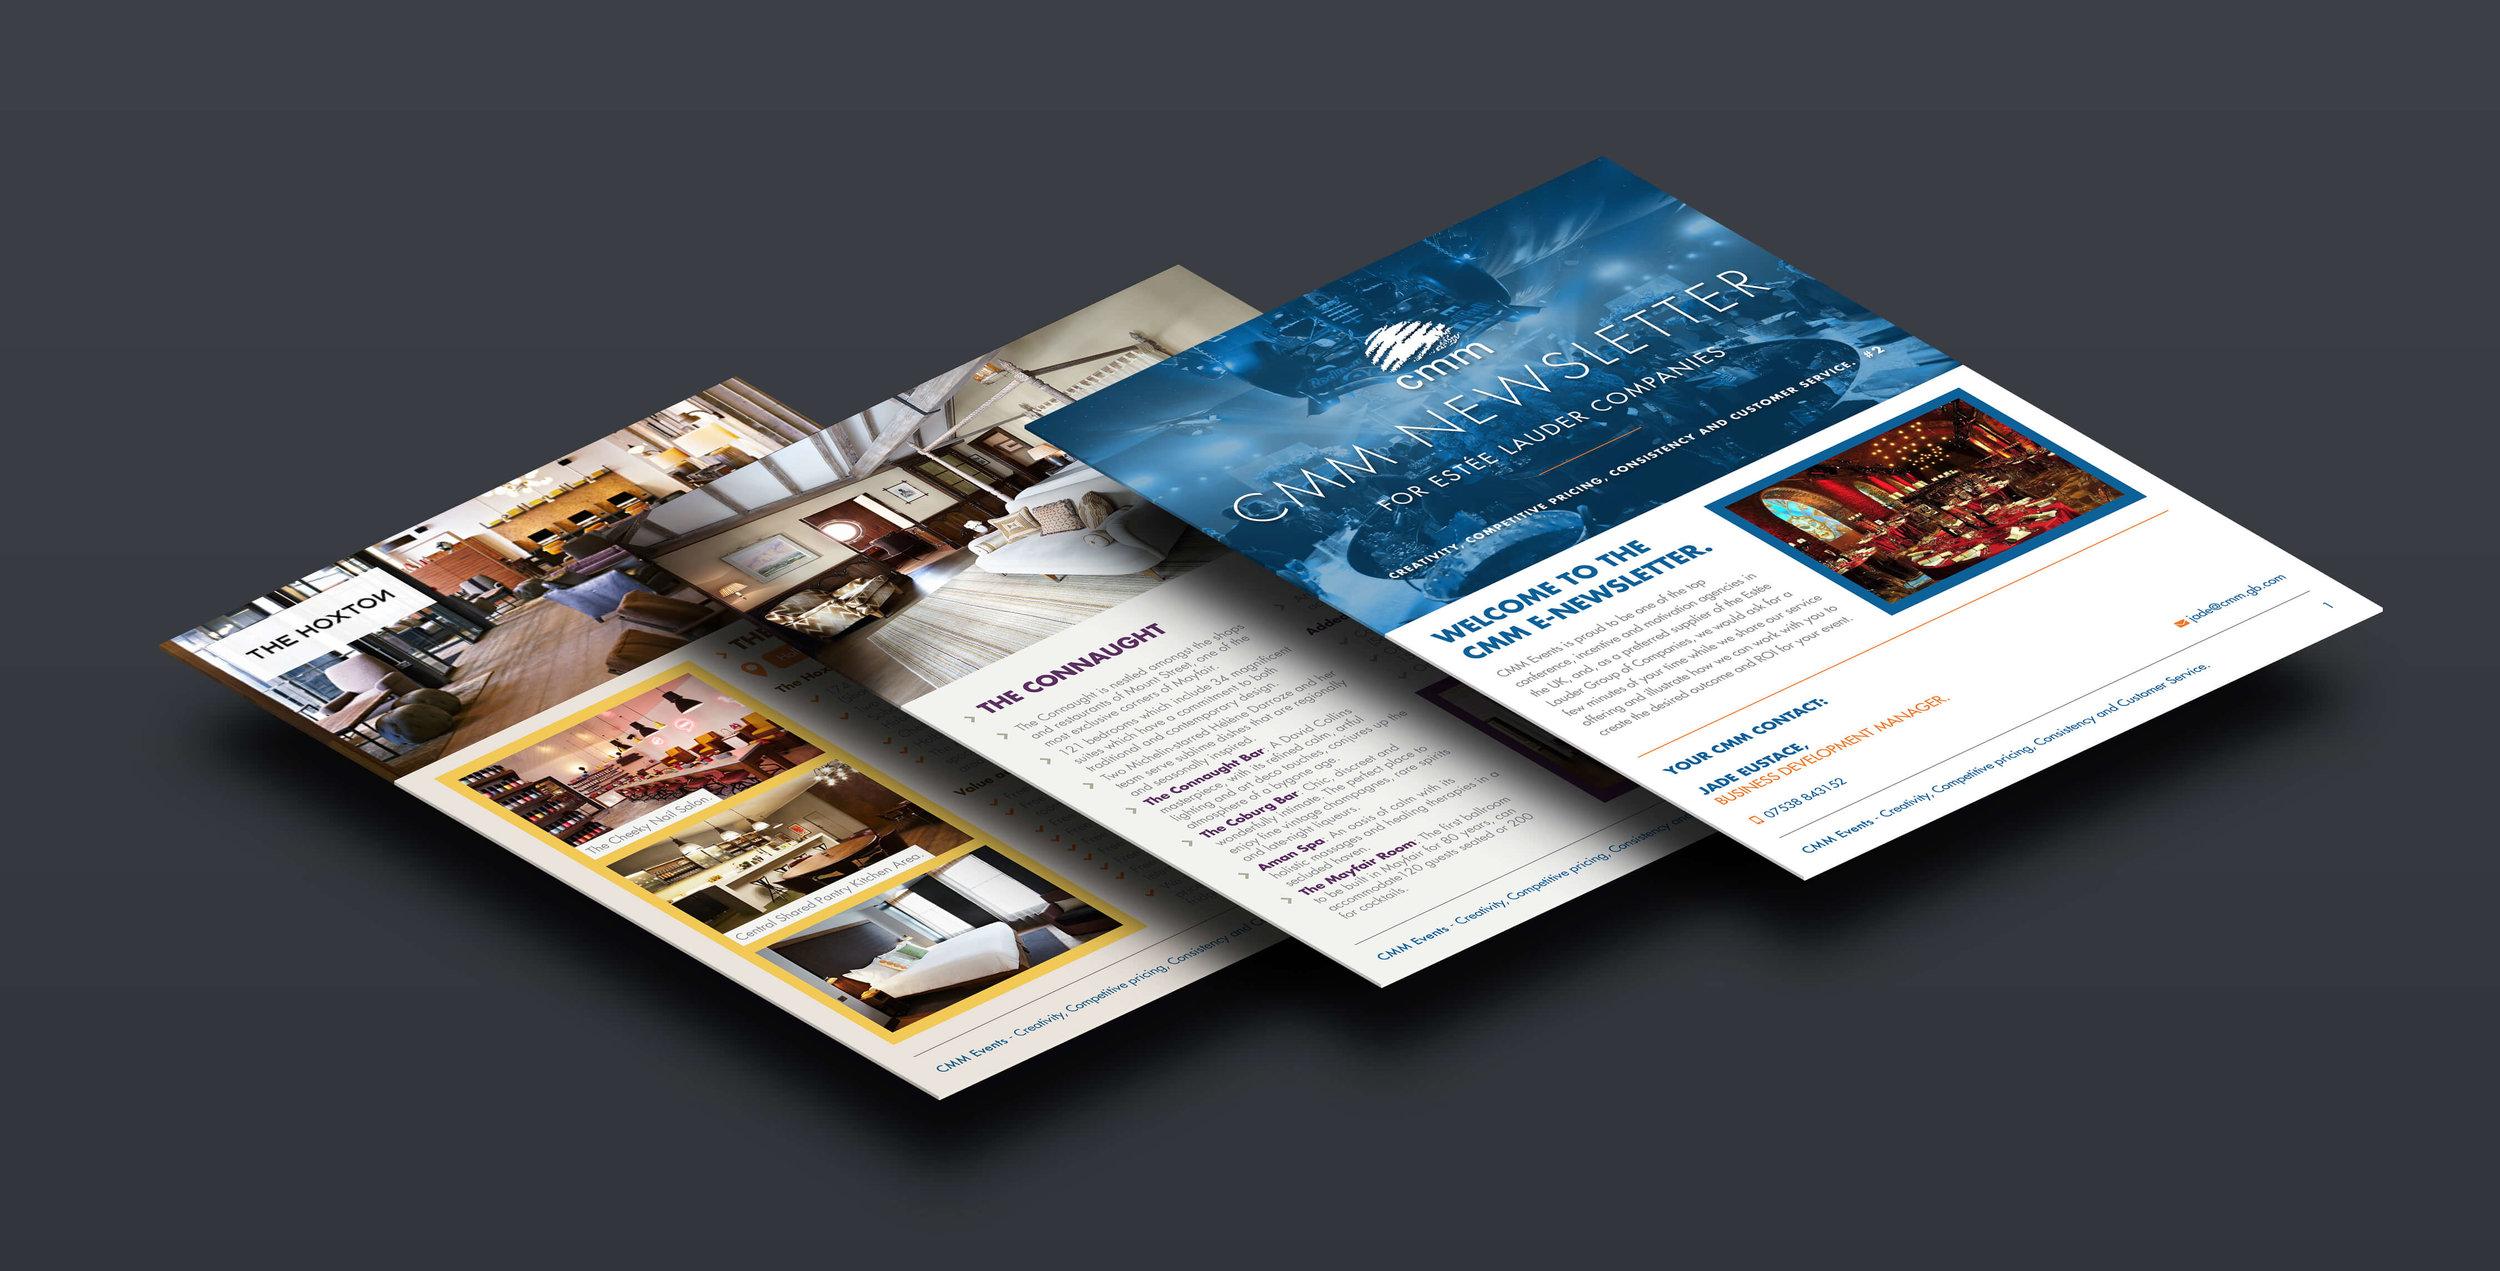 CMM Events Digital Newsletter Tablet Screens